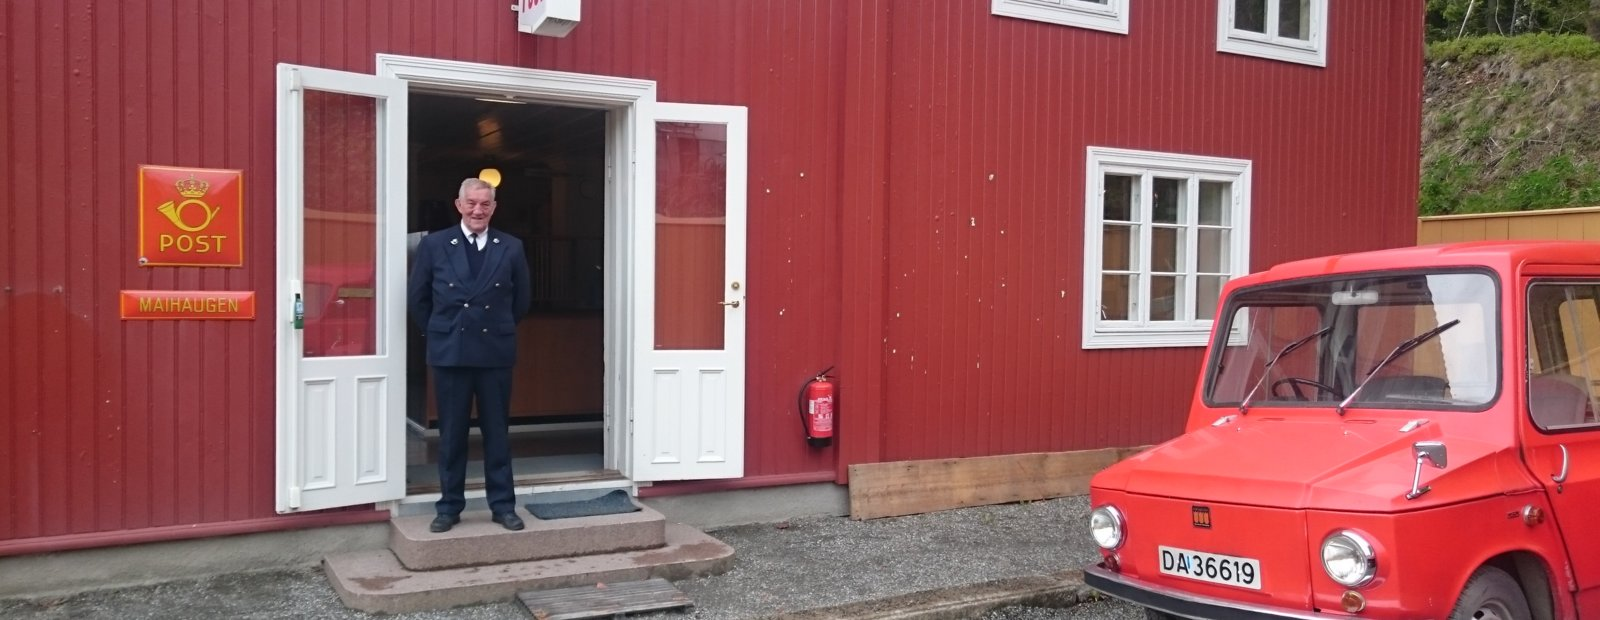 The Norwegian Post Museum, Maihaugen, Lillehammer, Meet the Postmaster